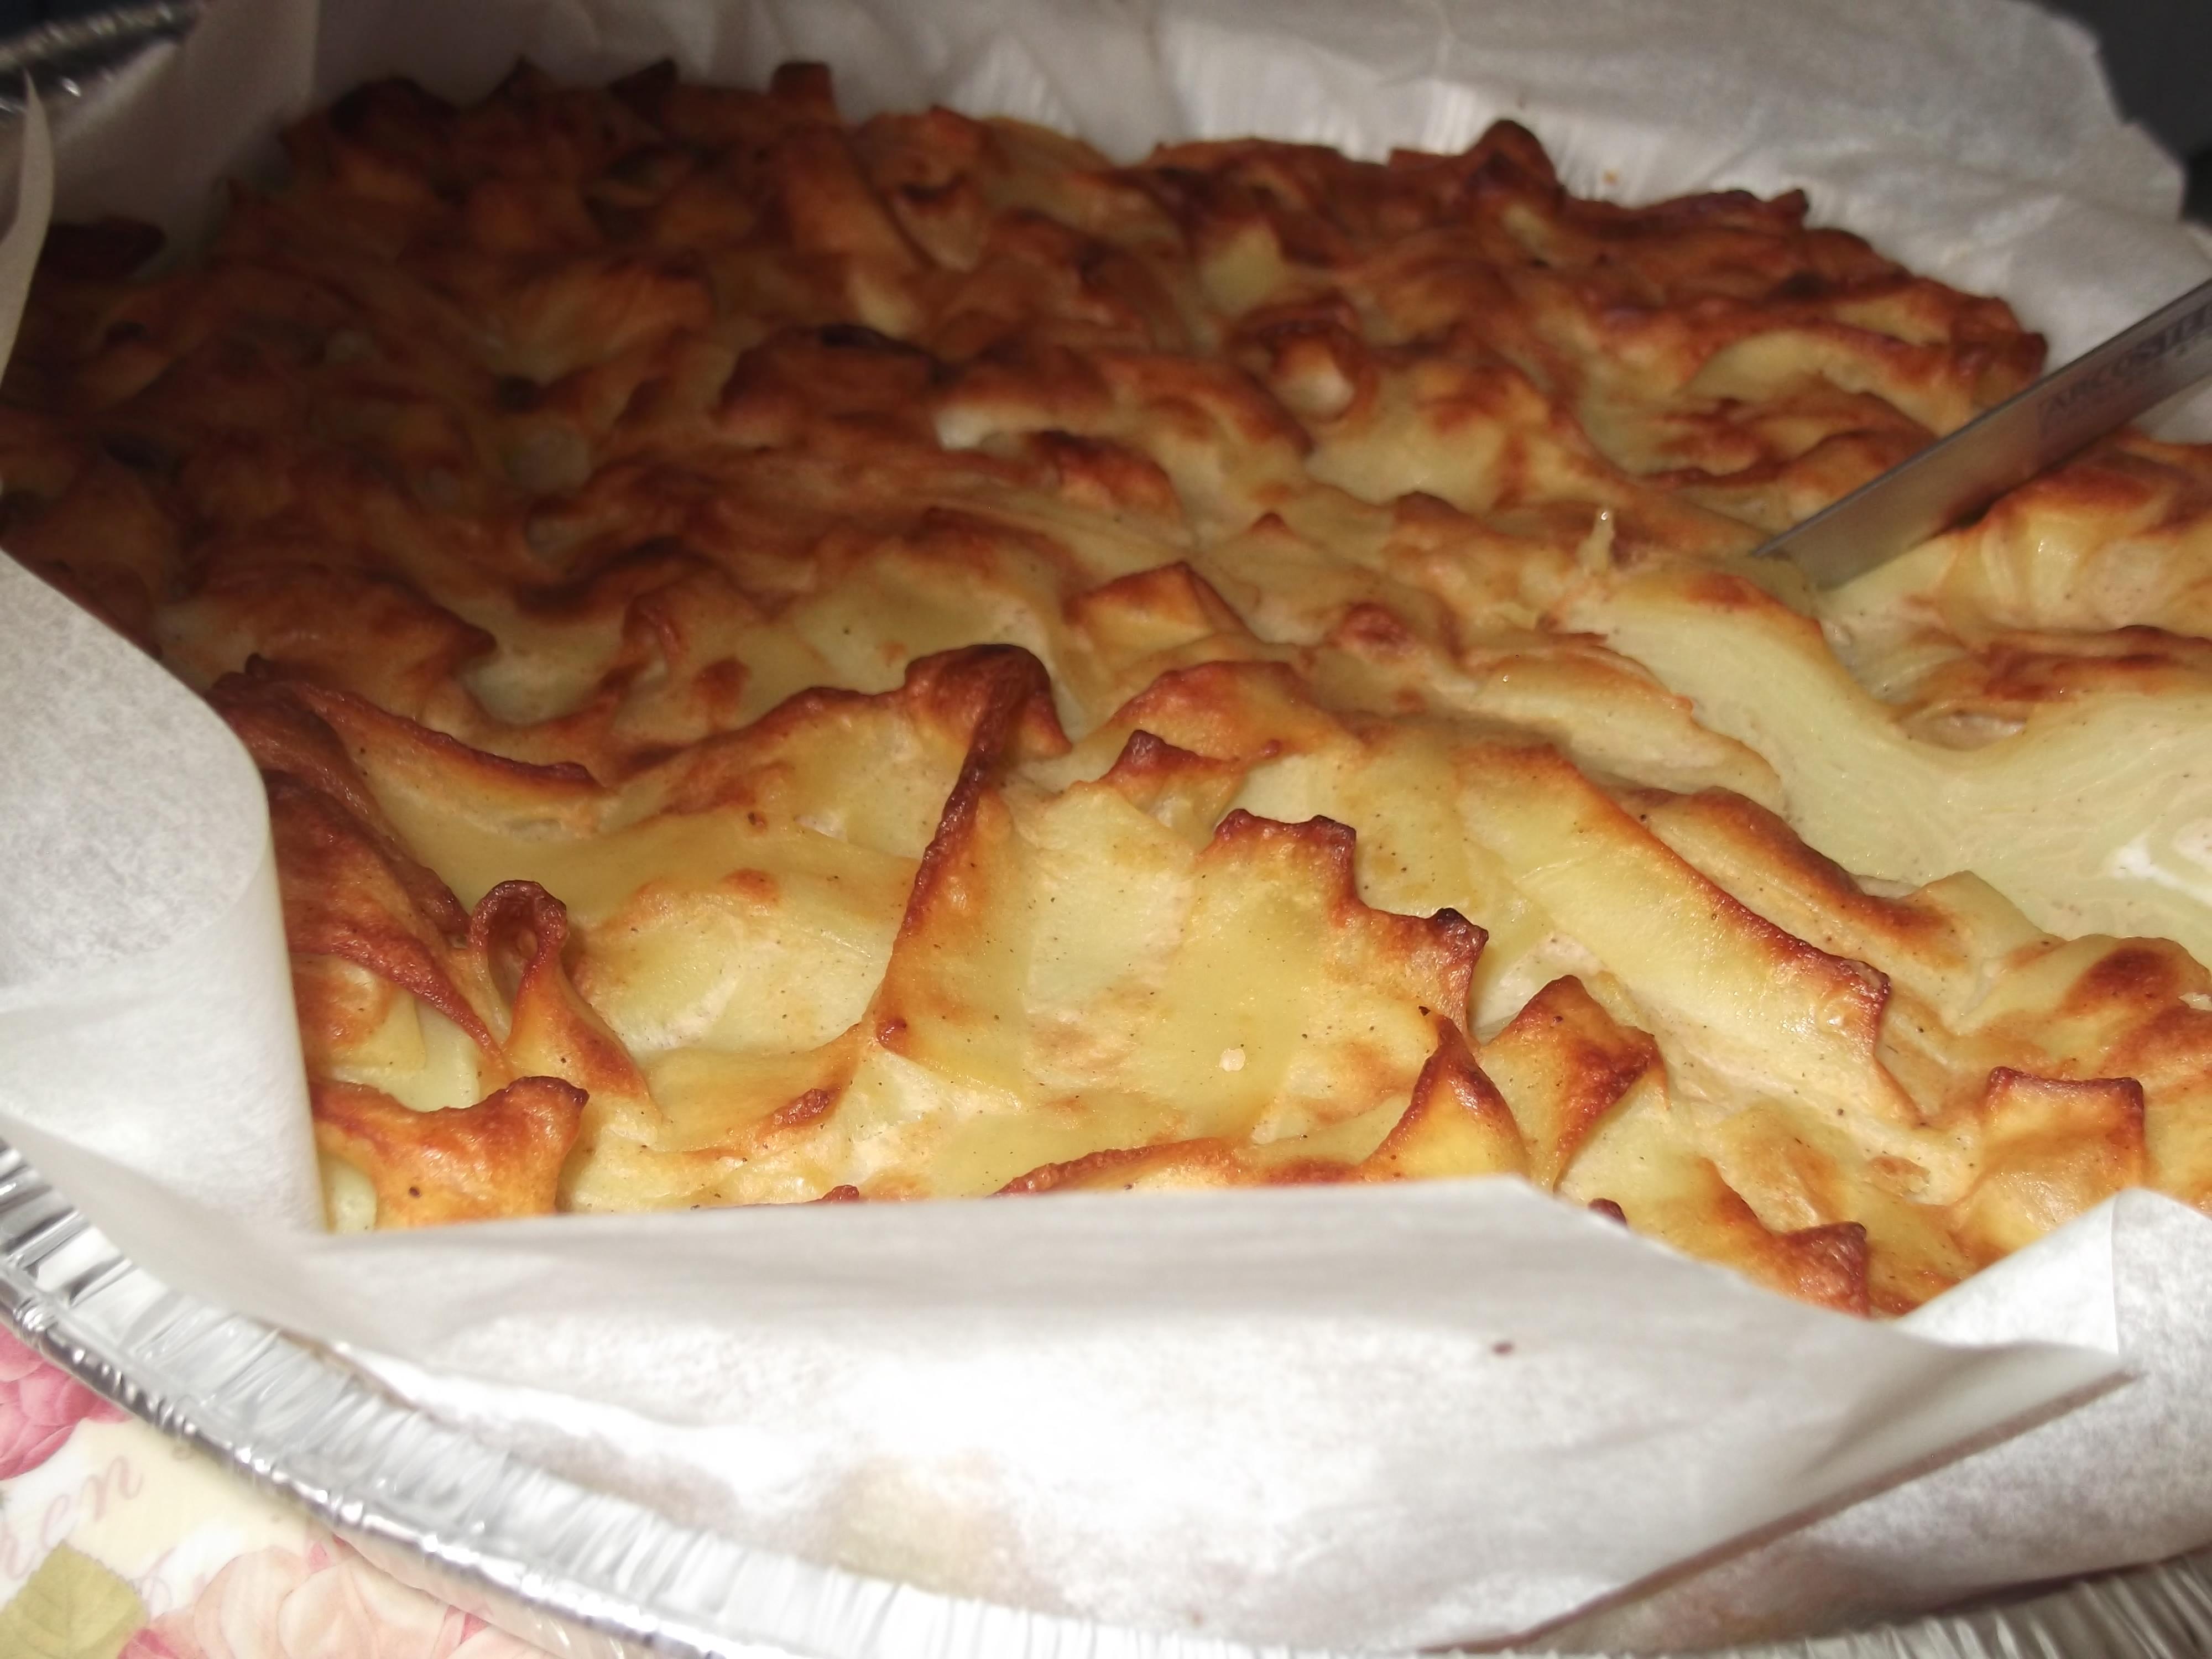 dscf5050 - פשטידת אטריות סבתא עם קינמון ורסק תפוחים